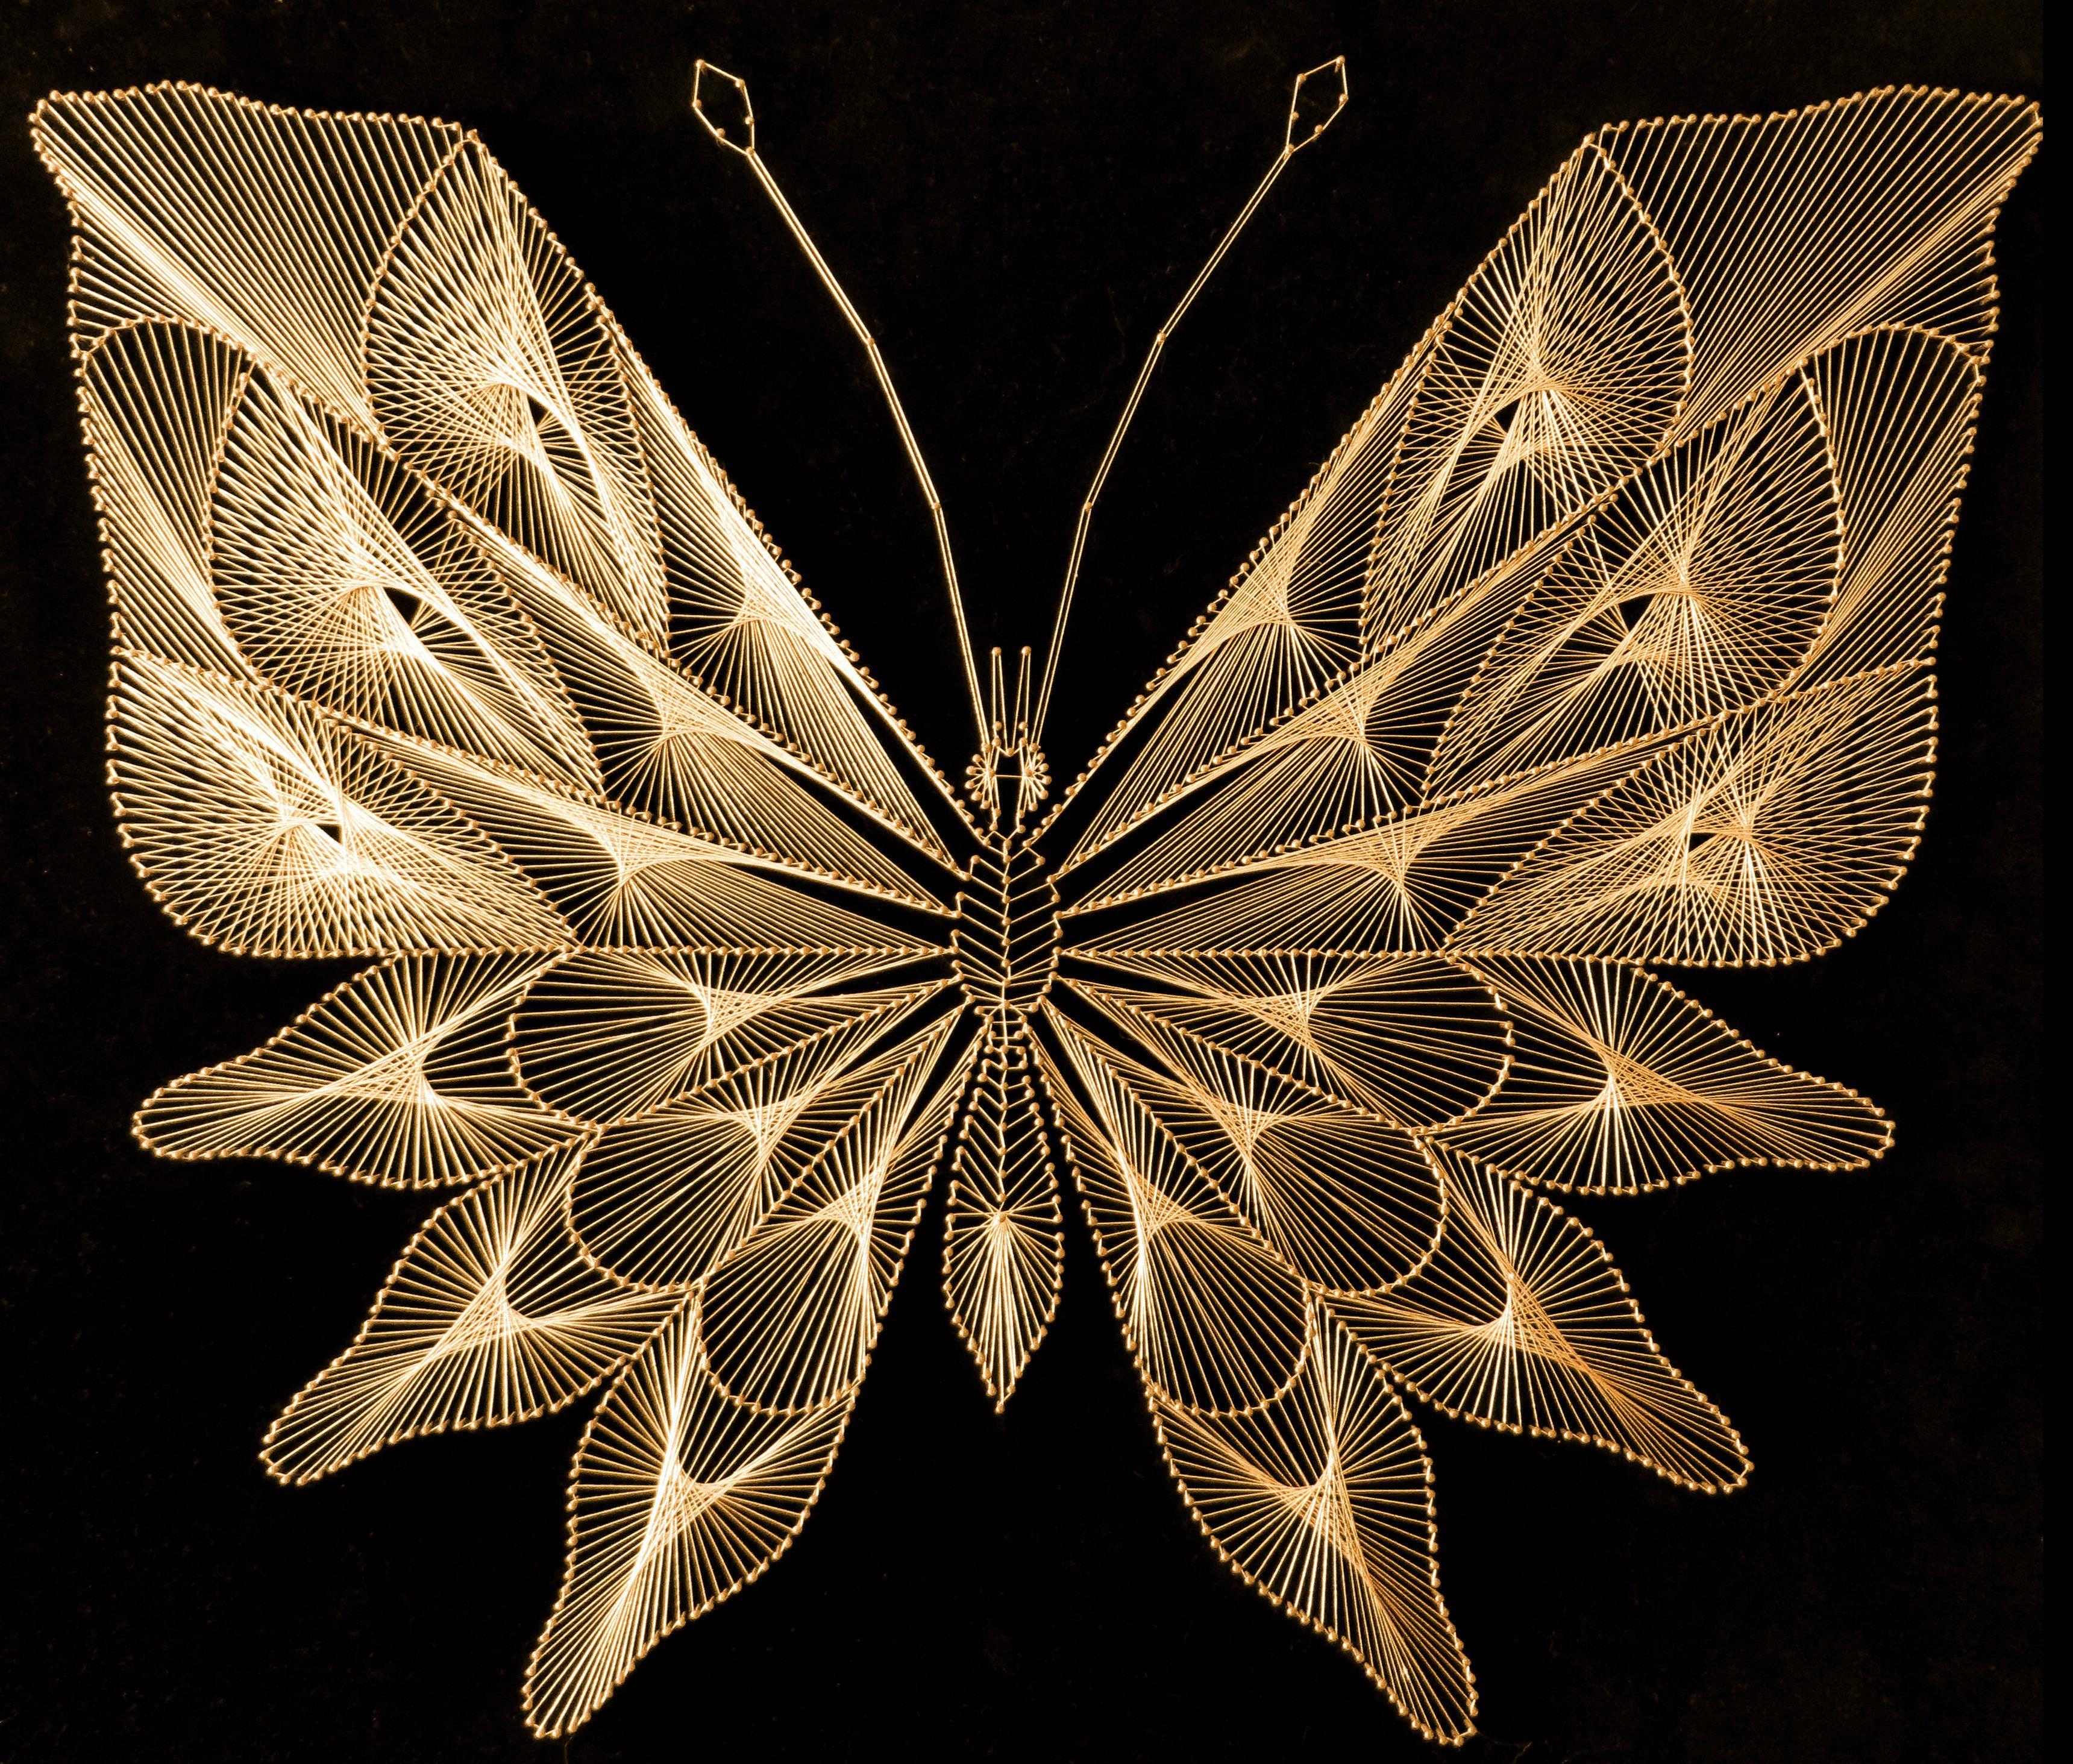 zelfgemaakt vlinder van gouddraad stringart homemade. Black Bedroom Furniture Sets. Home Design Ideas